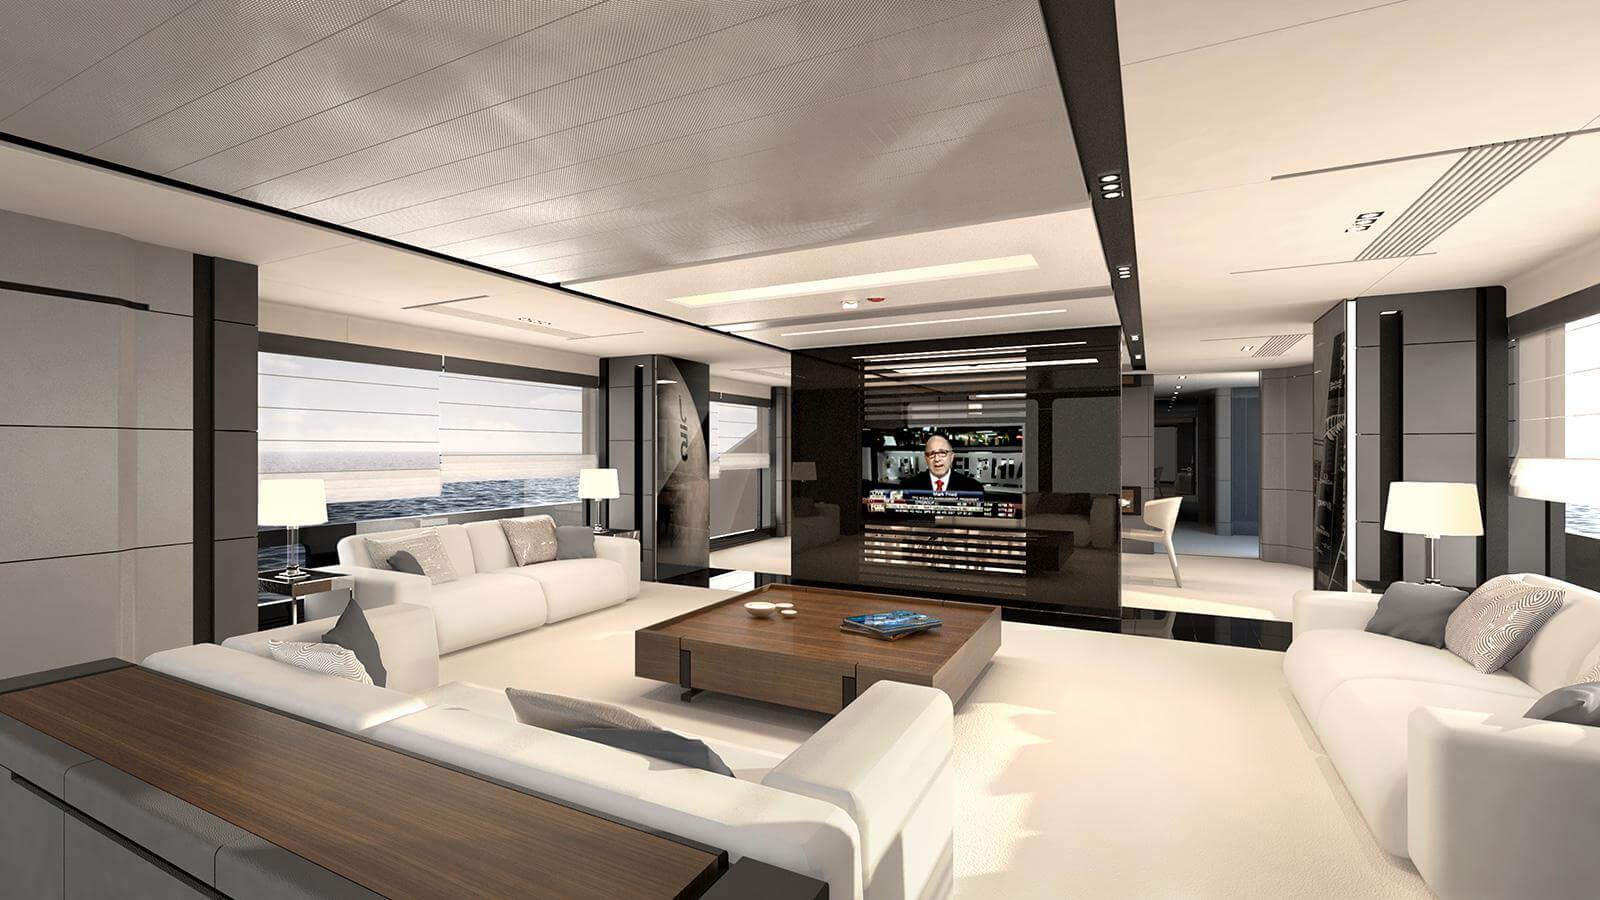 Aeon 380 Concept Yacht Saloon - Scaro Design